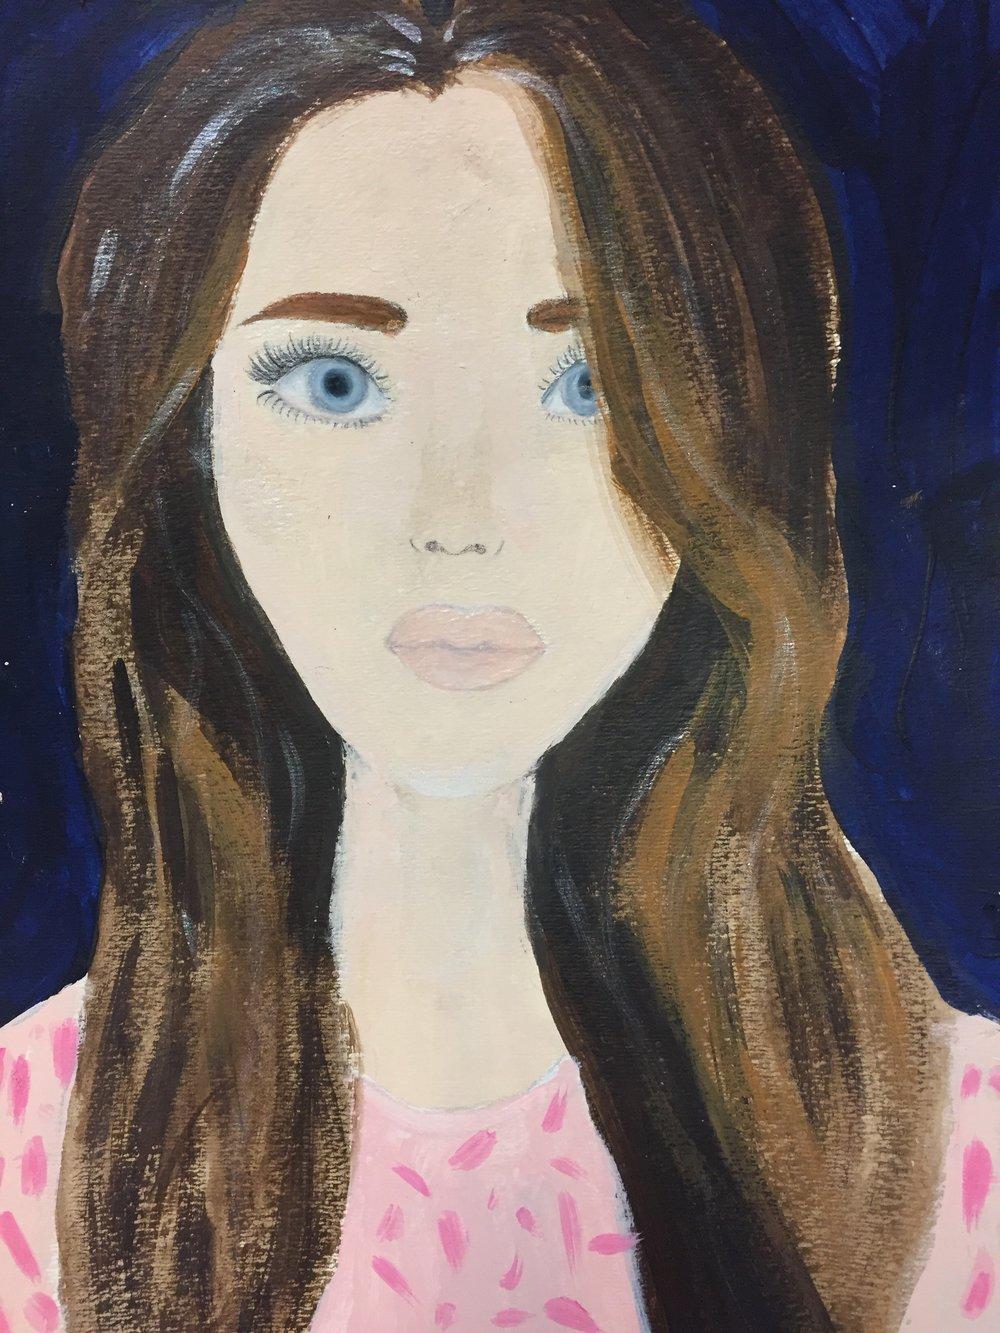 Erin, age 12